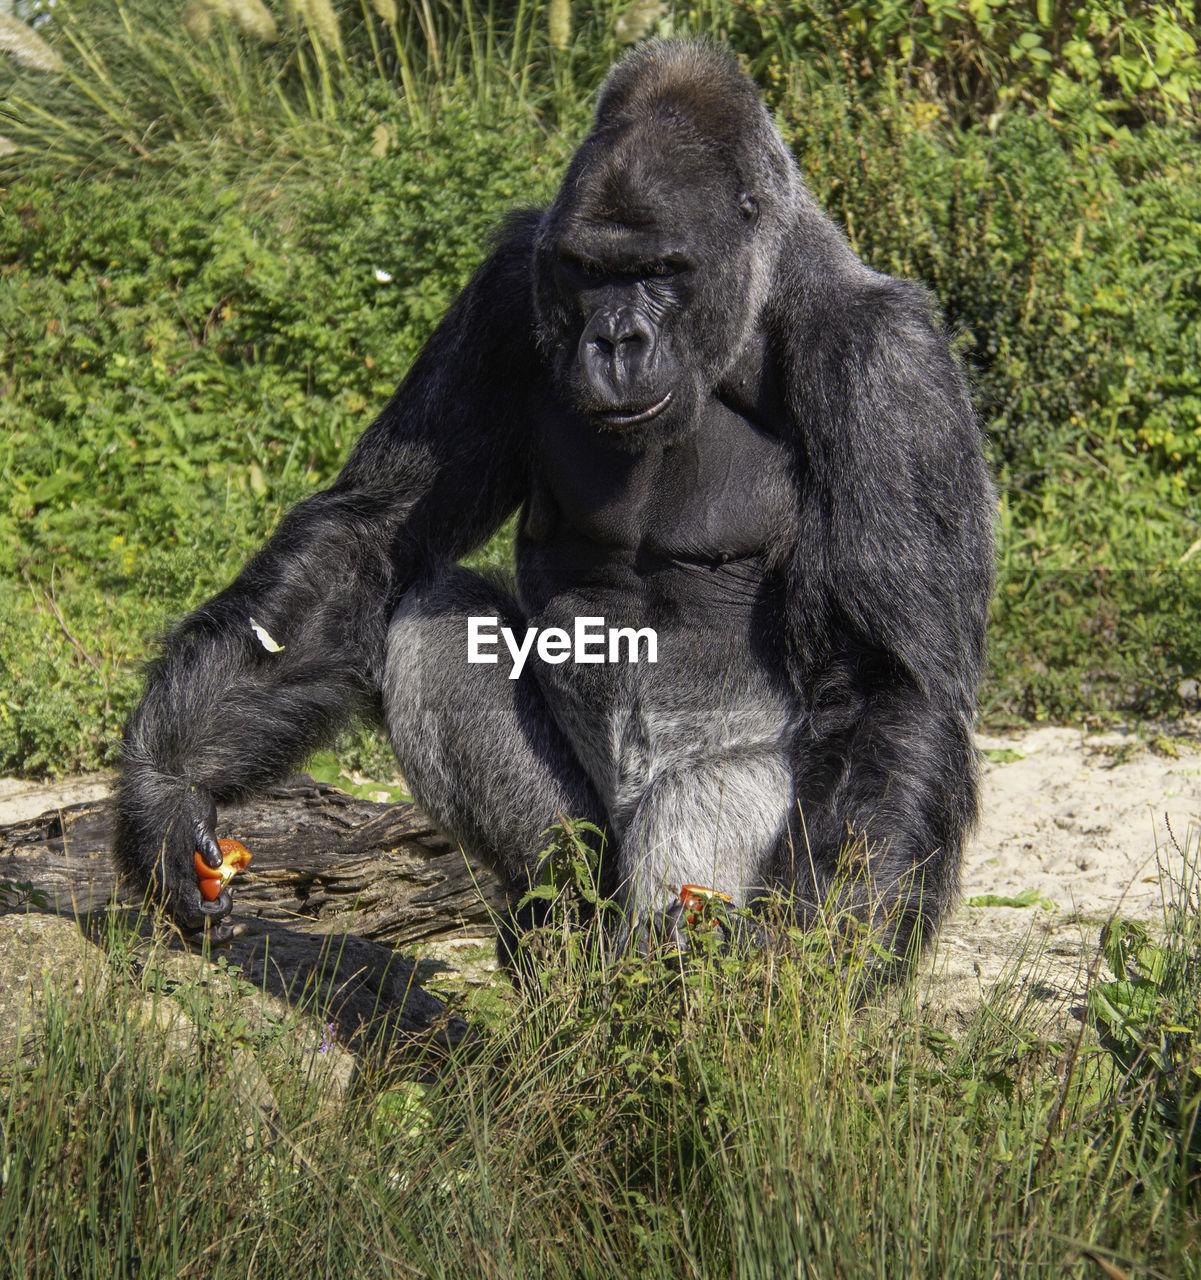 primate, mammal, animal wildlife, ape, grass, animals in the wild, plant, nature, no people, gorilla, sitting, day, vertebrate, one animal, full length, outdoors